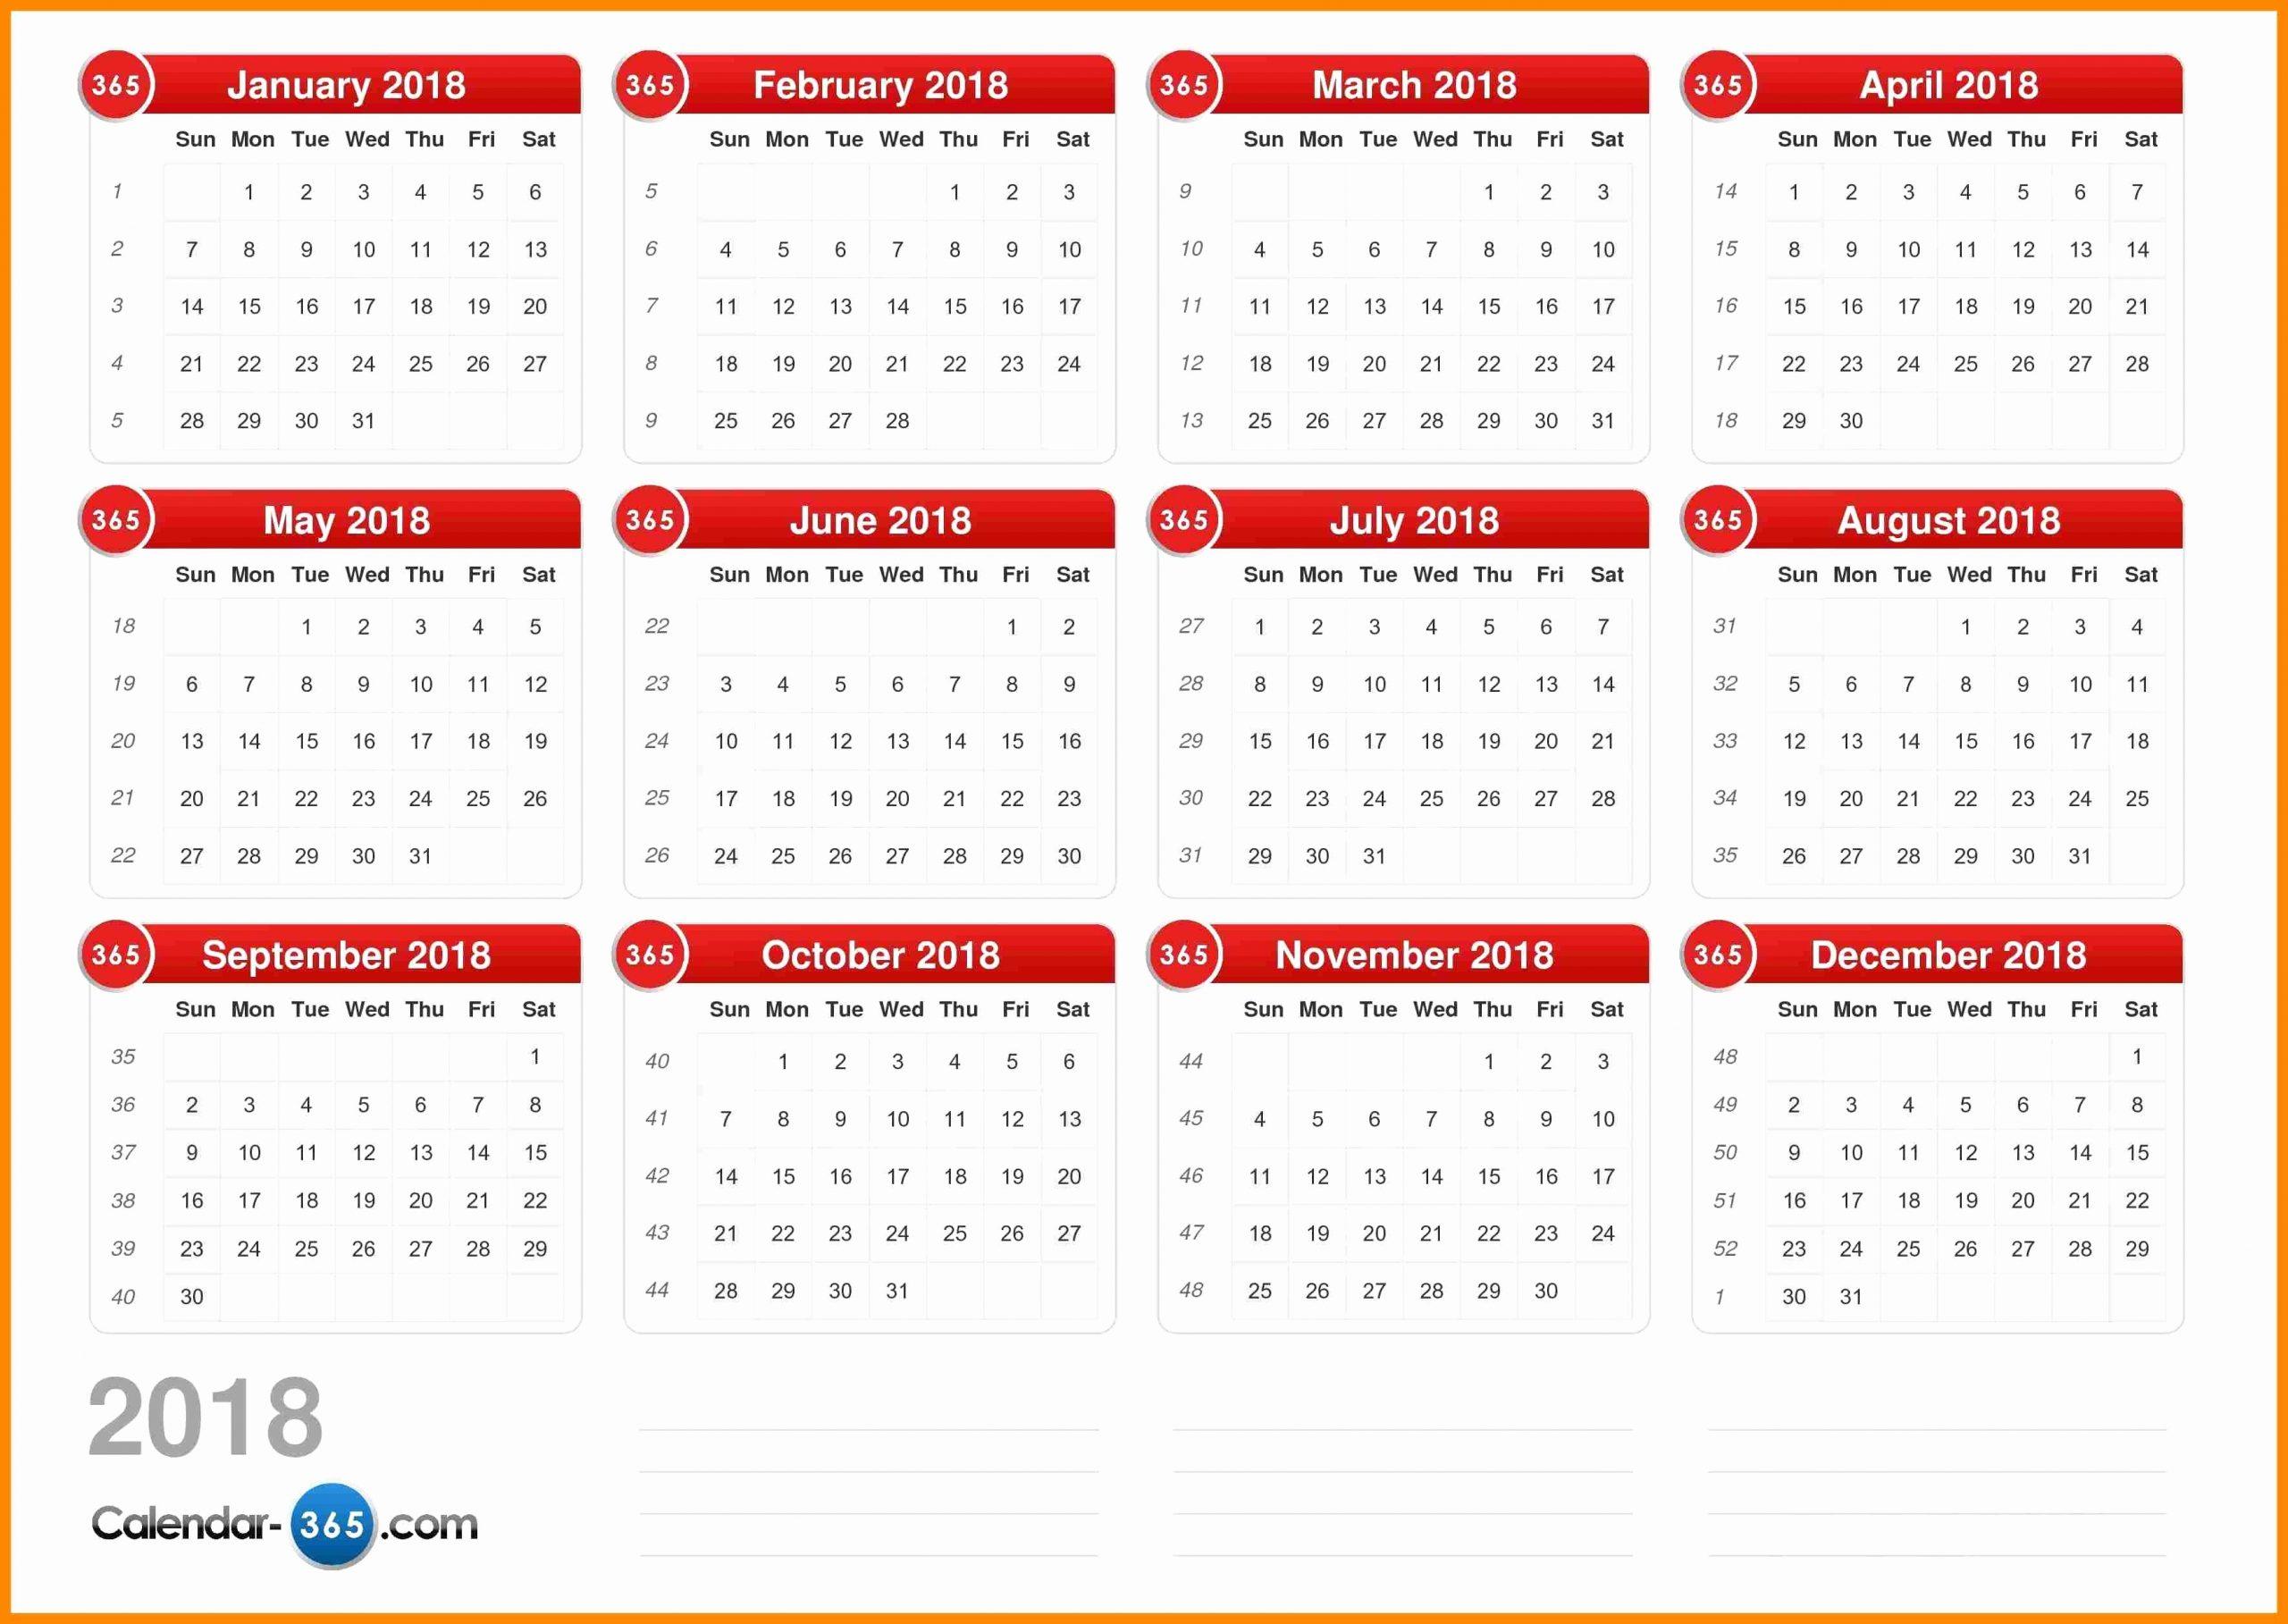 2020 Adp Payroll Calendar Biweekly | Payroll Calendar 2021